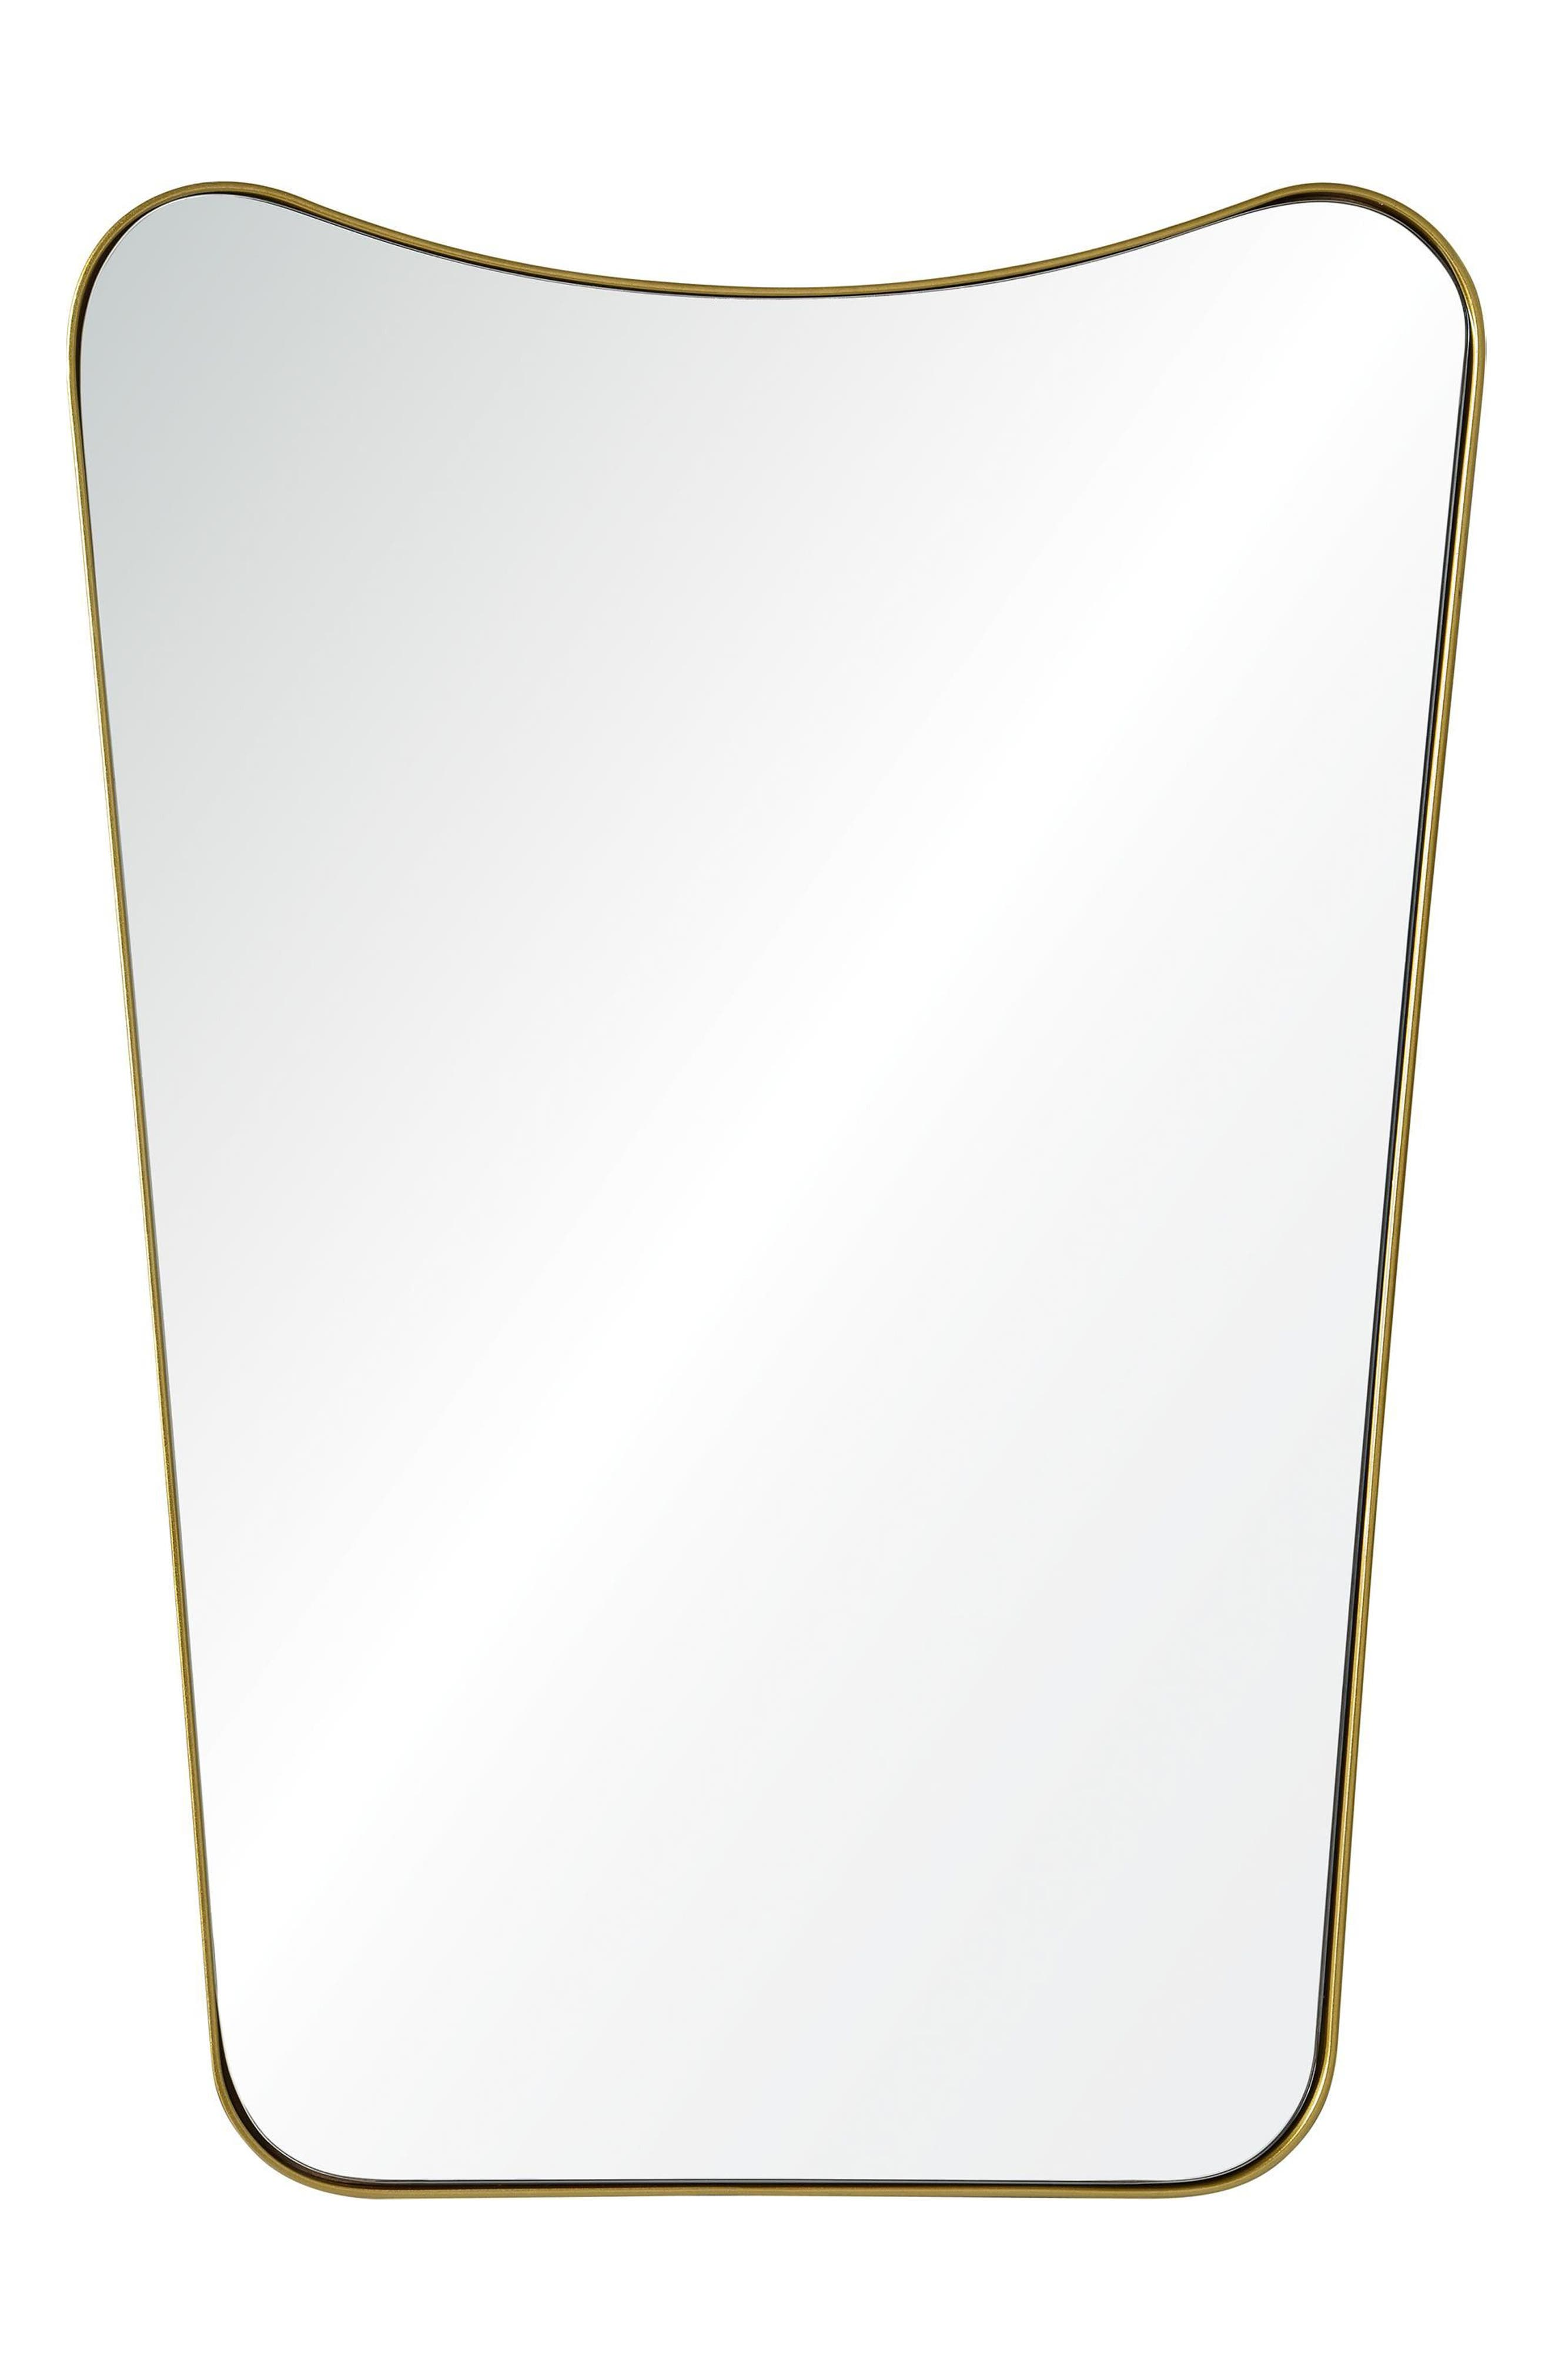 Tufa Mirror,                         Main,                         color, Gold Powder Coated